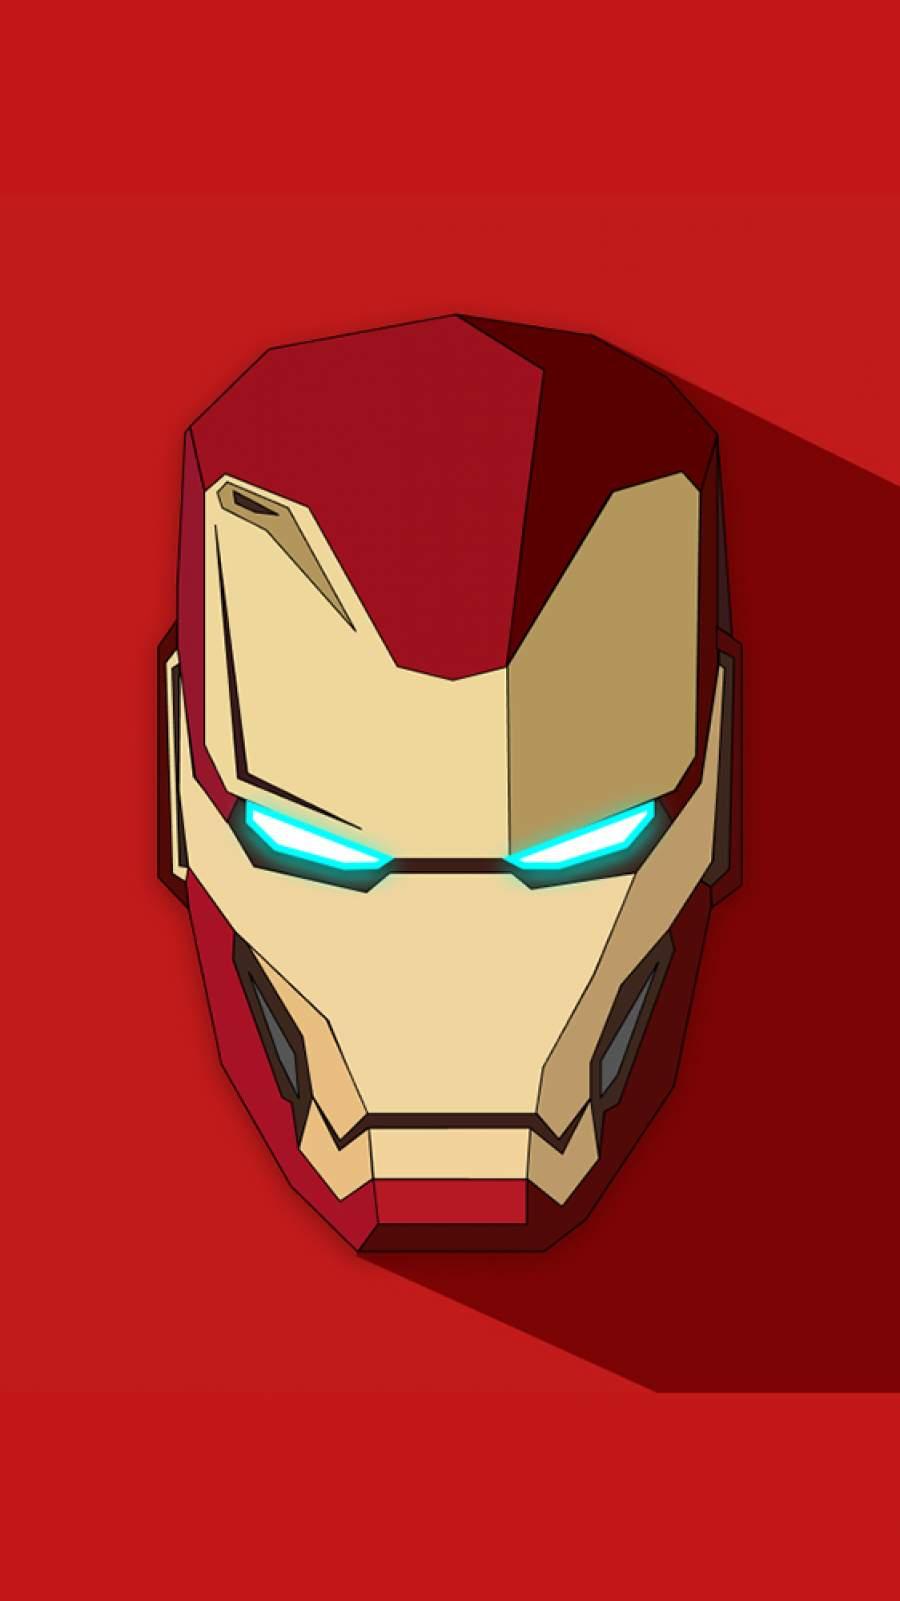 Iron Man Armor Mask iPhone Wallpaper